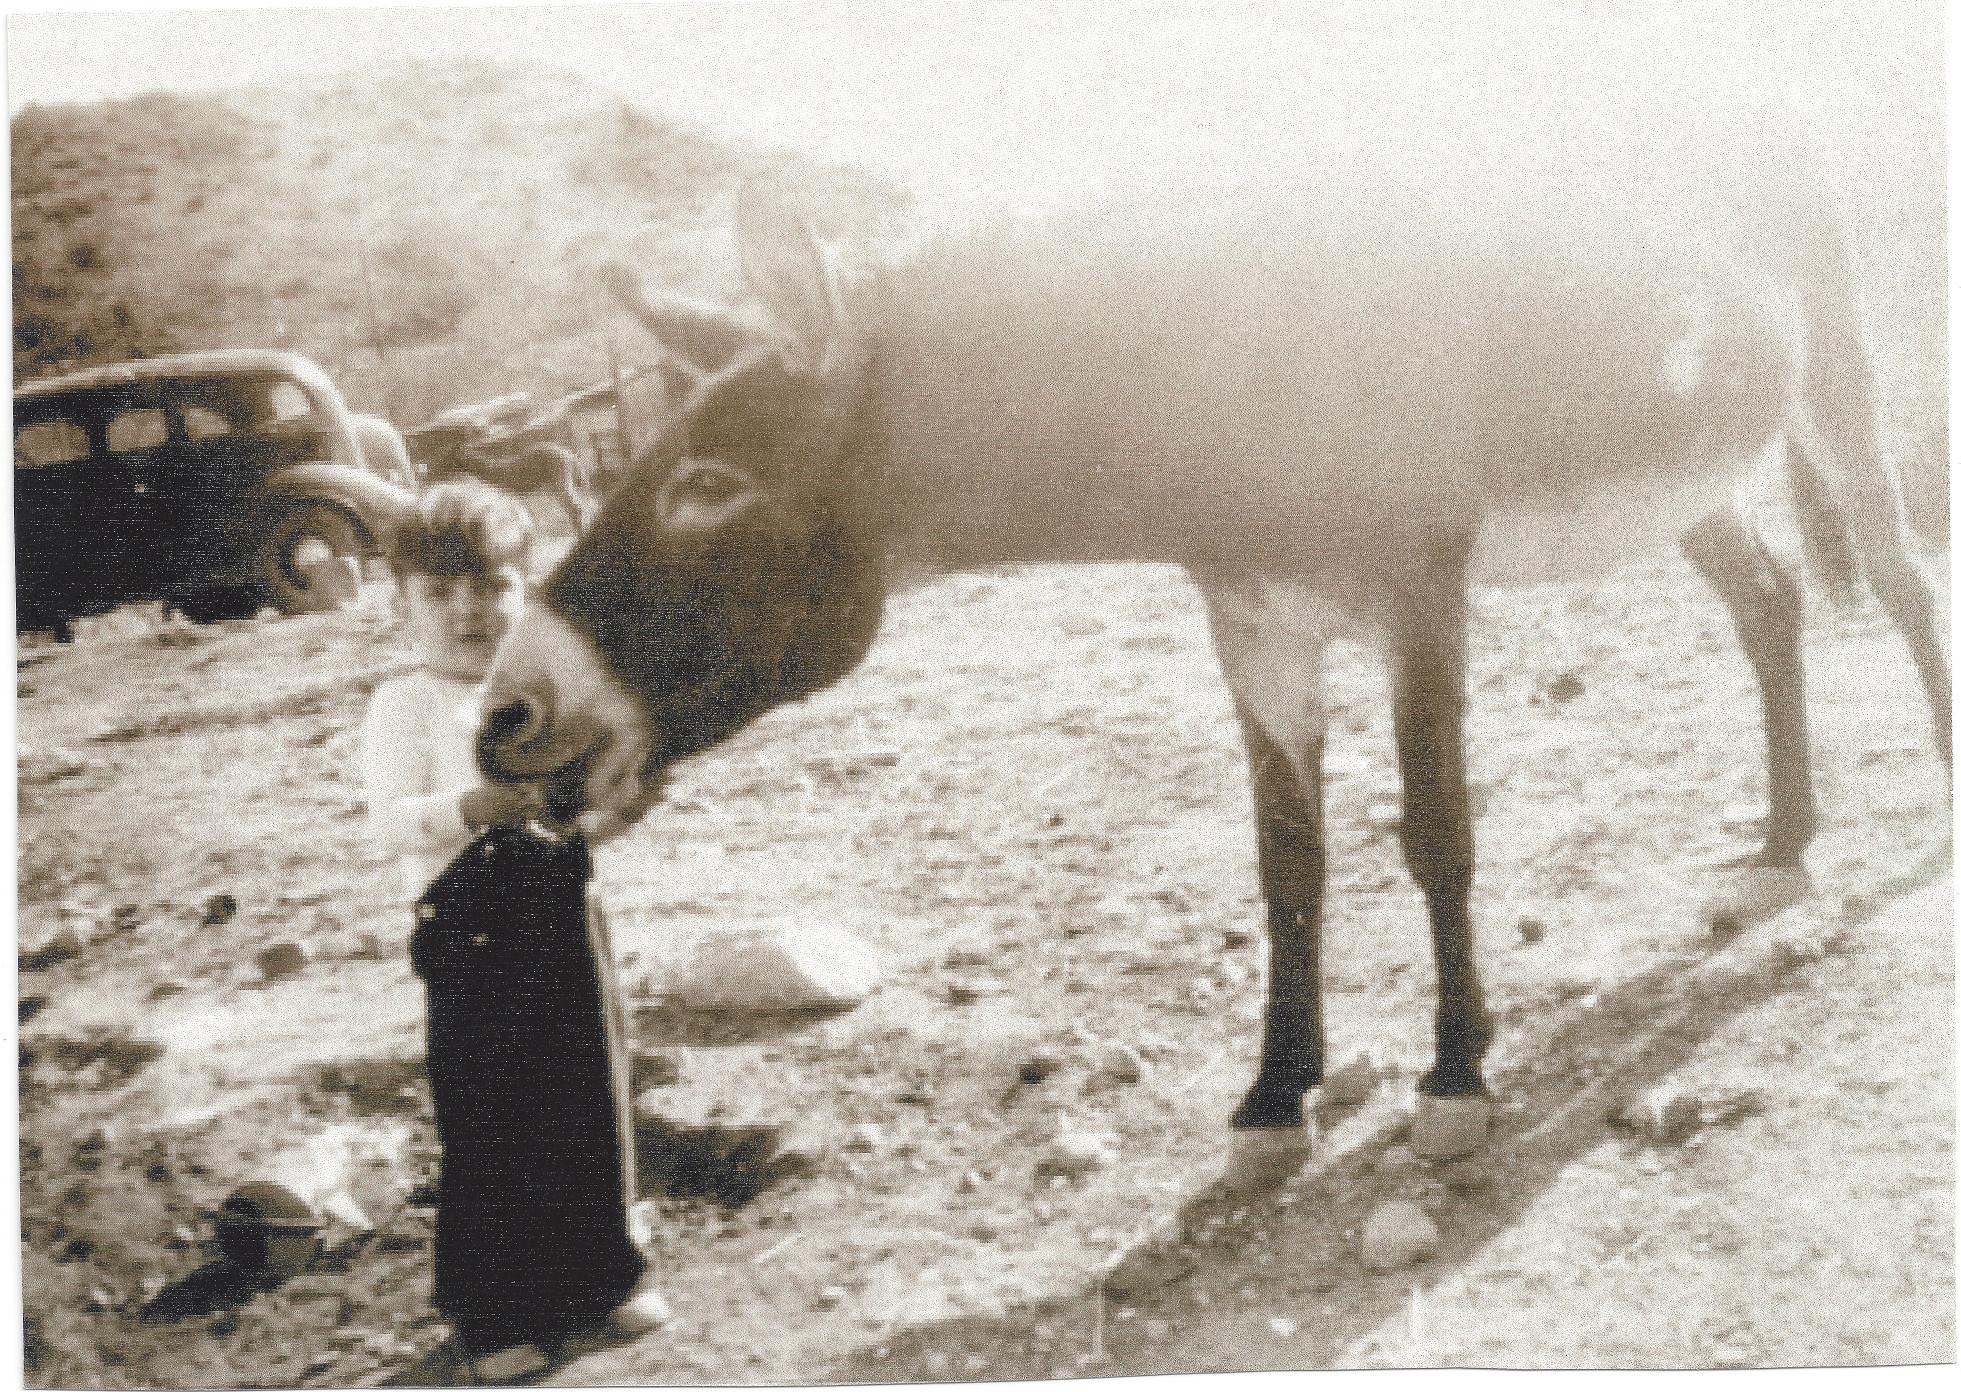 Skip WIlson with Donkey 2